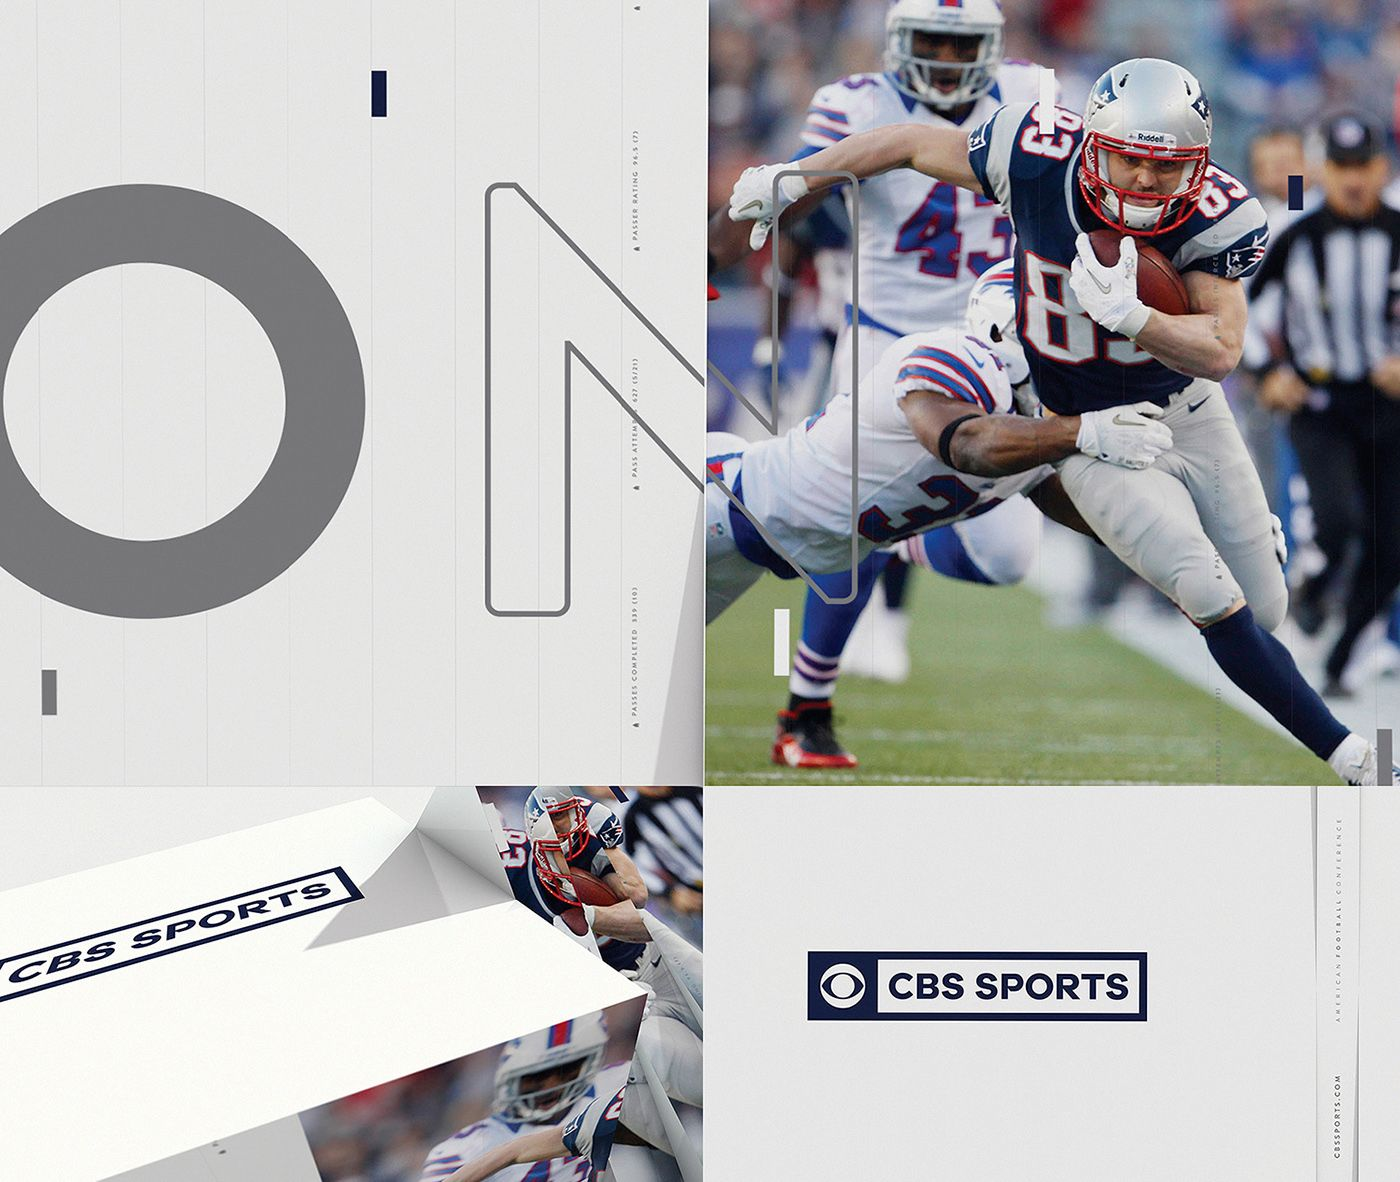 CBS Sports Rebrand on Behance Cbs sports, Sports, Cbs